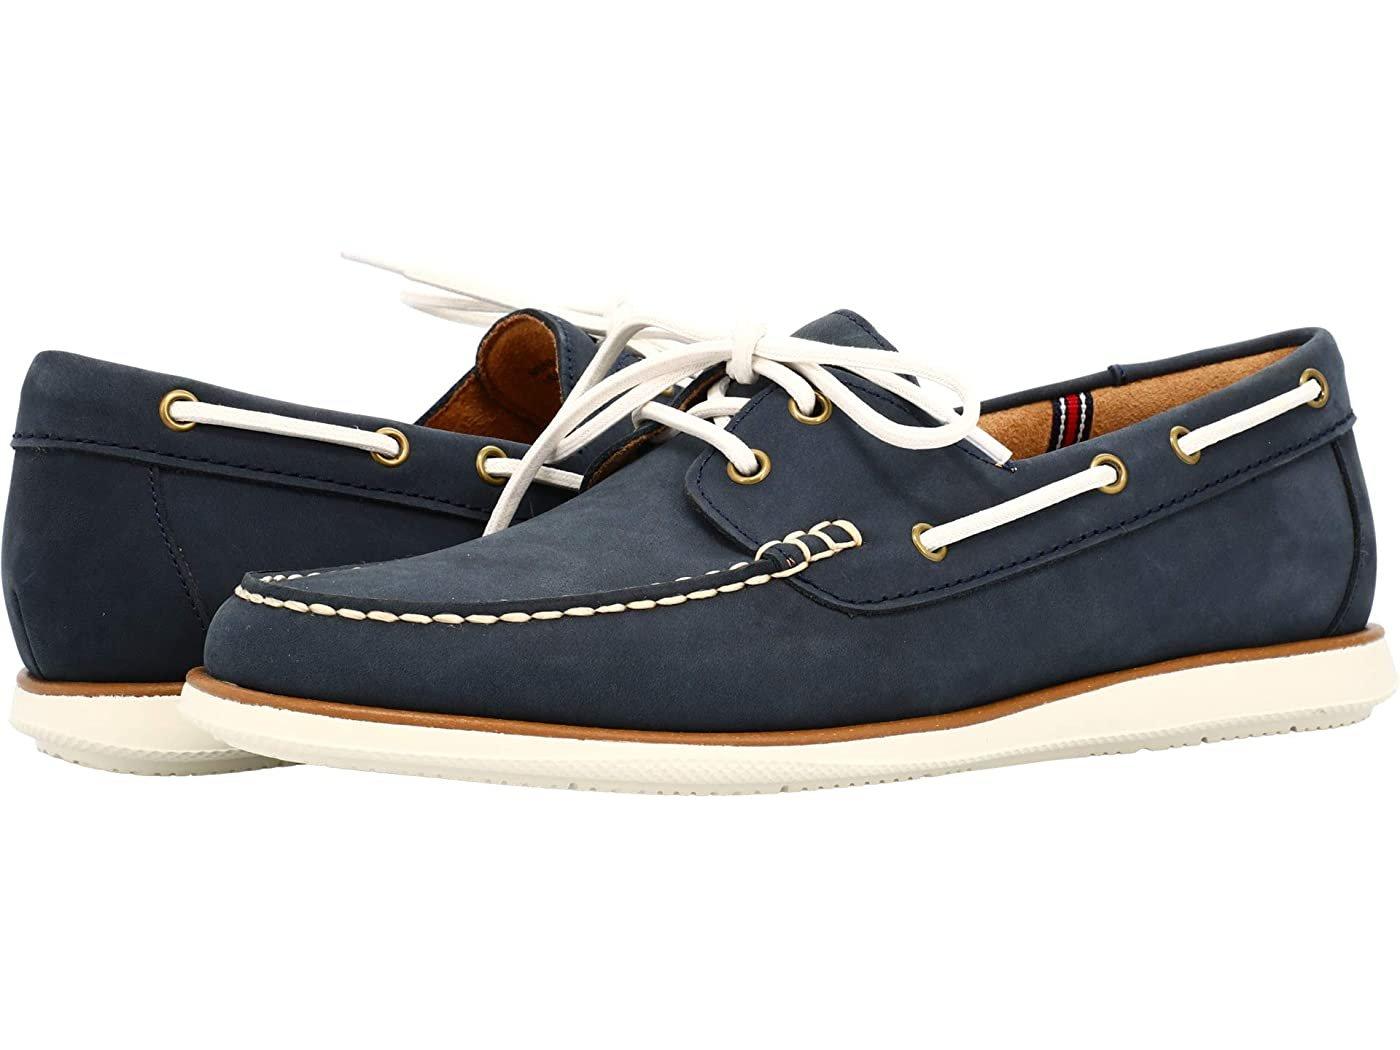 Florsheim boat shoe